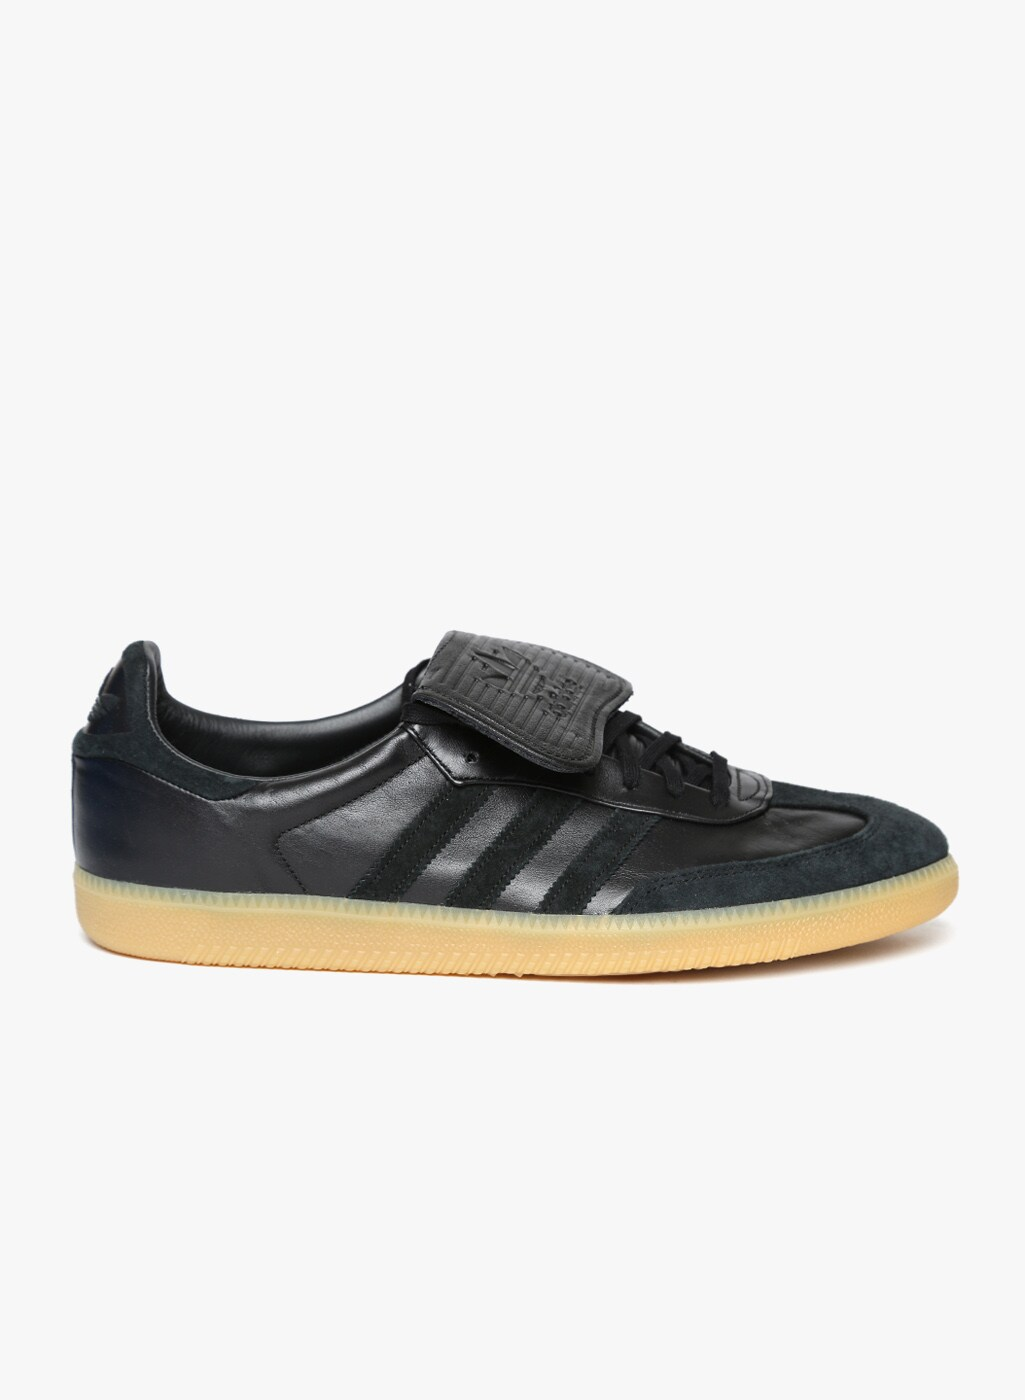 4c37d73ba80111 Adidas Originals - Buy Adidas Originals online in India - Jabong